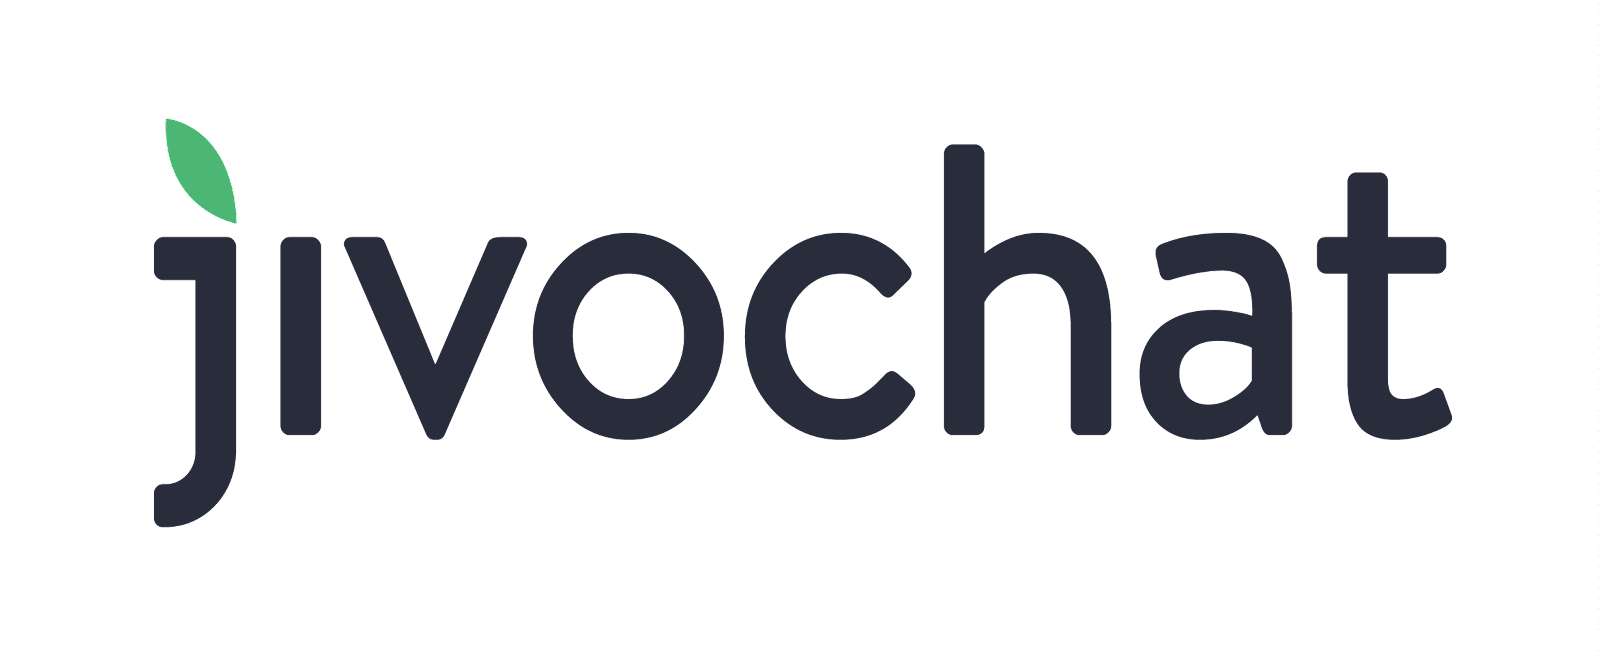 Banner - Jivochat